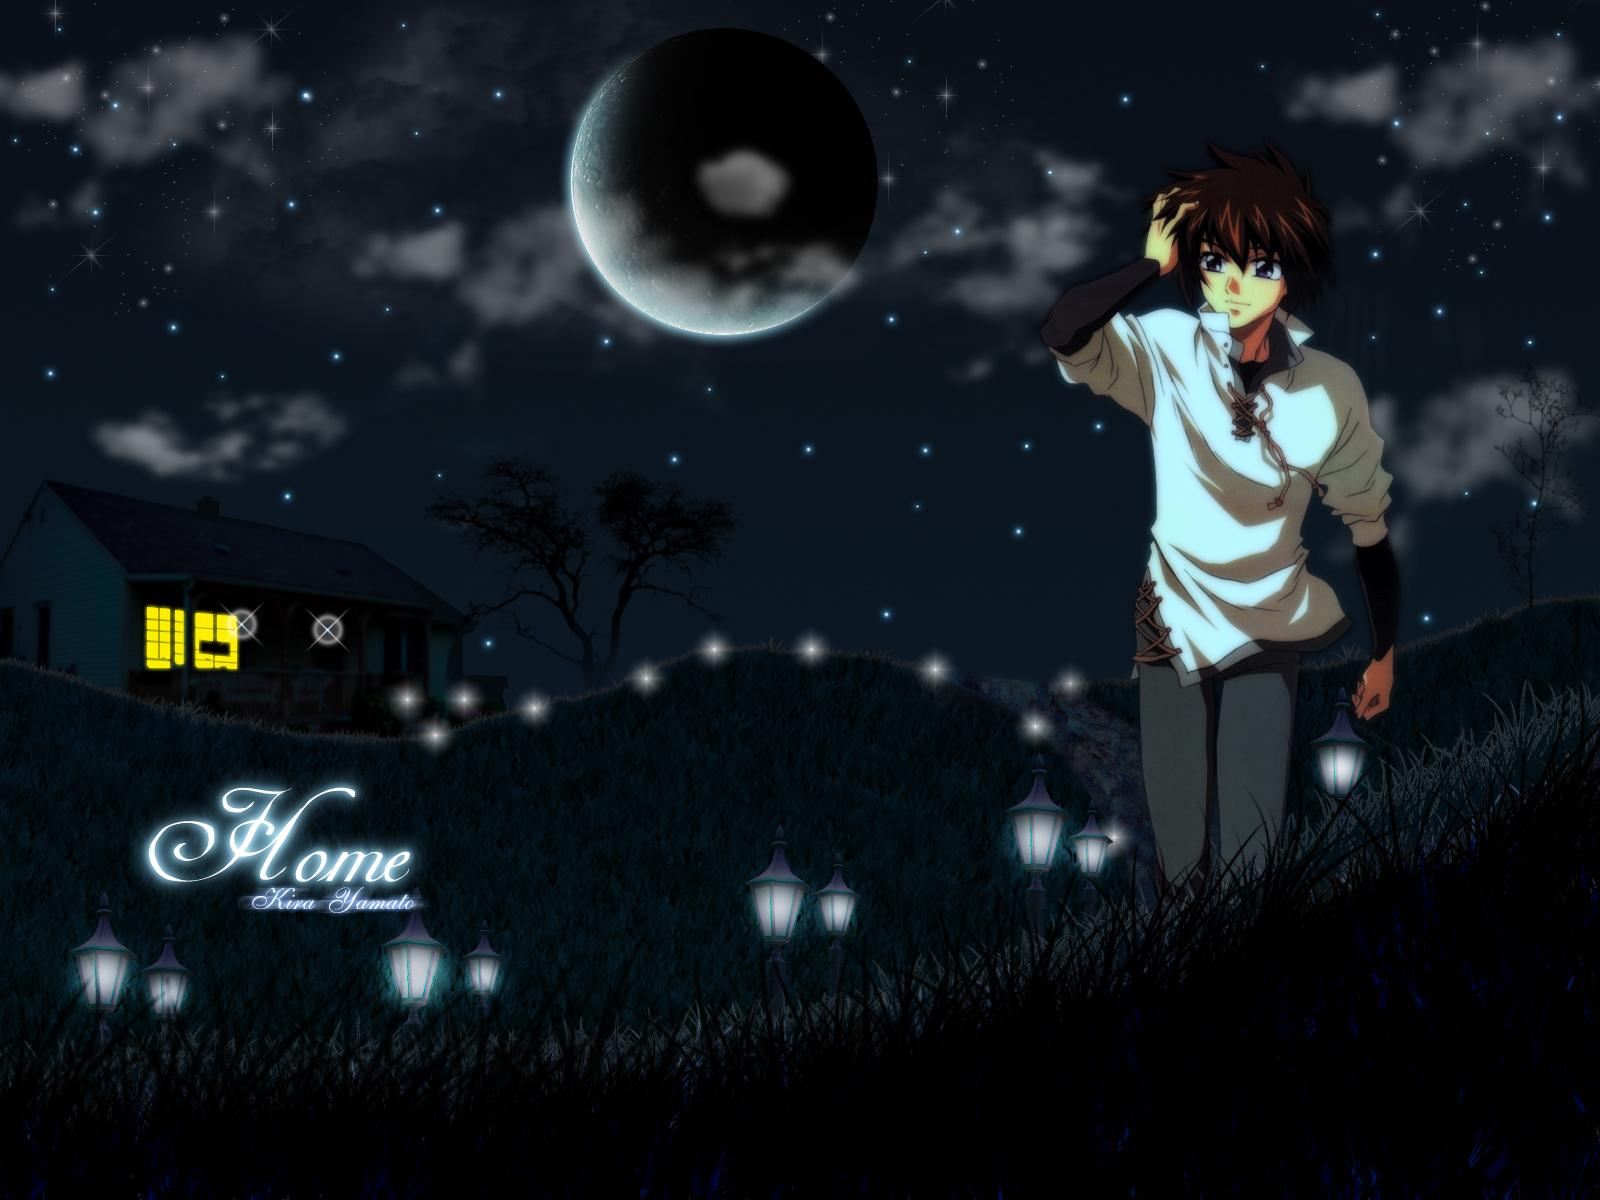 kira yamato wallpaper zerochan anime image board